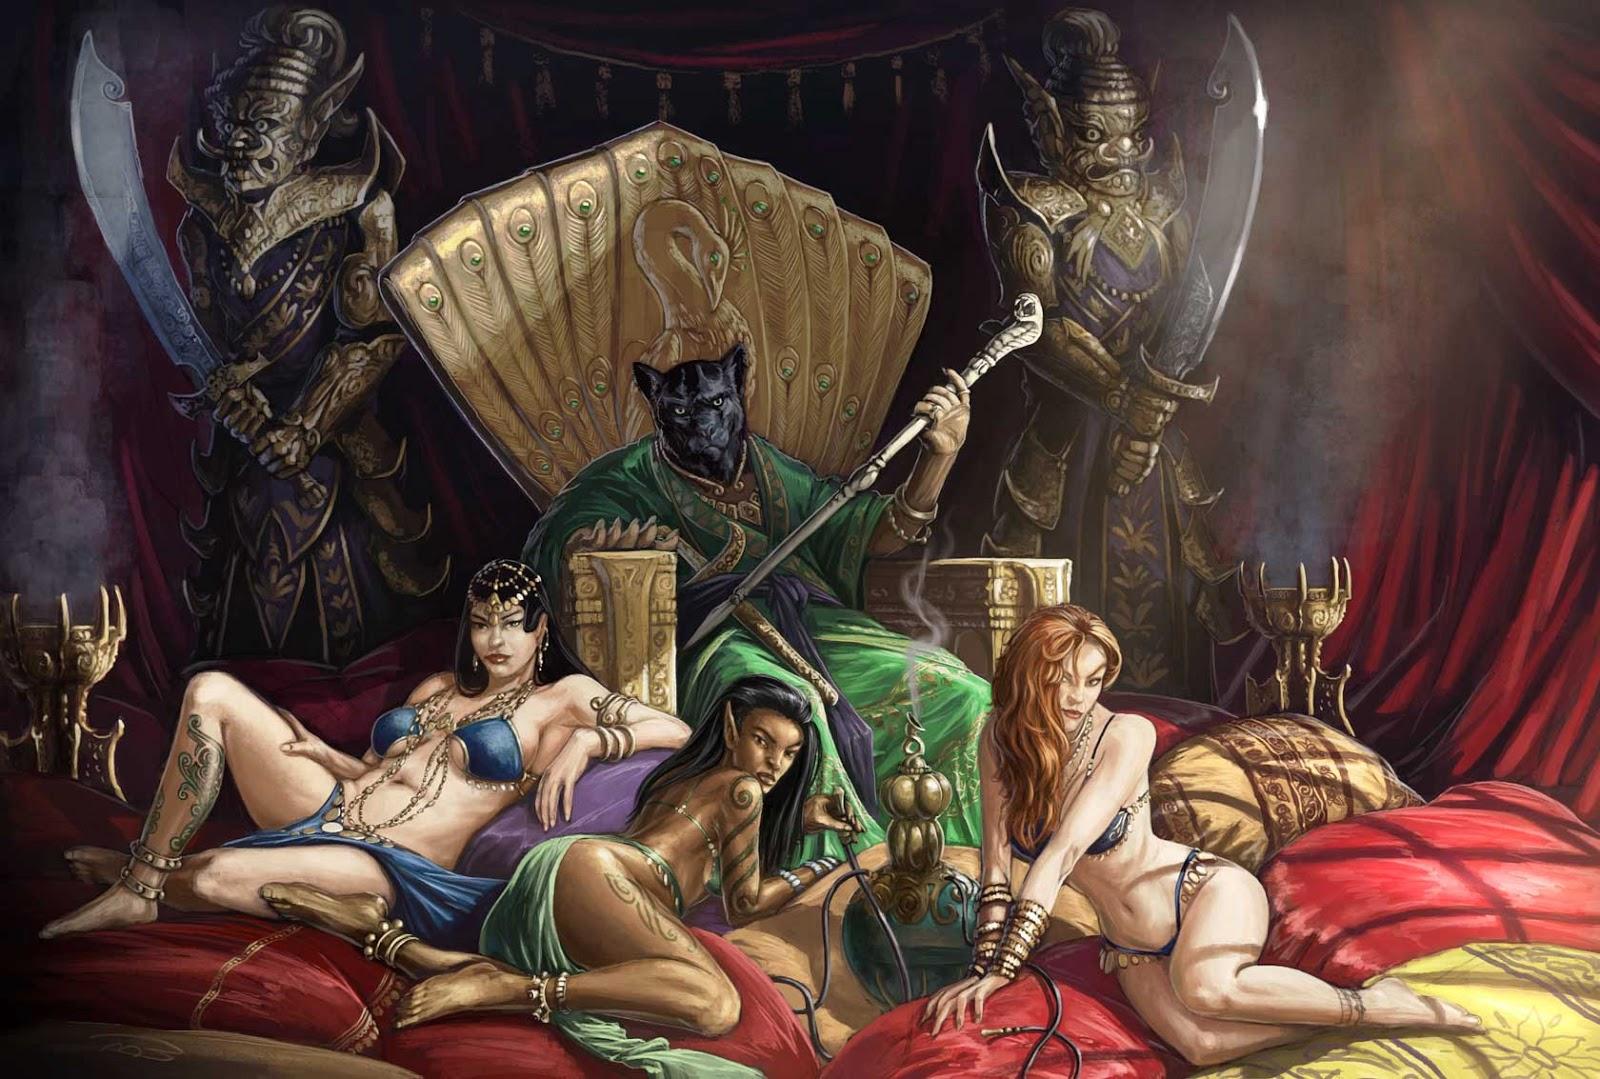 Lok demon sex game underworld naked clip